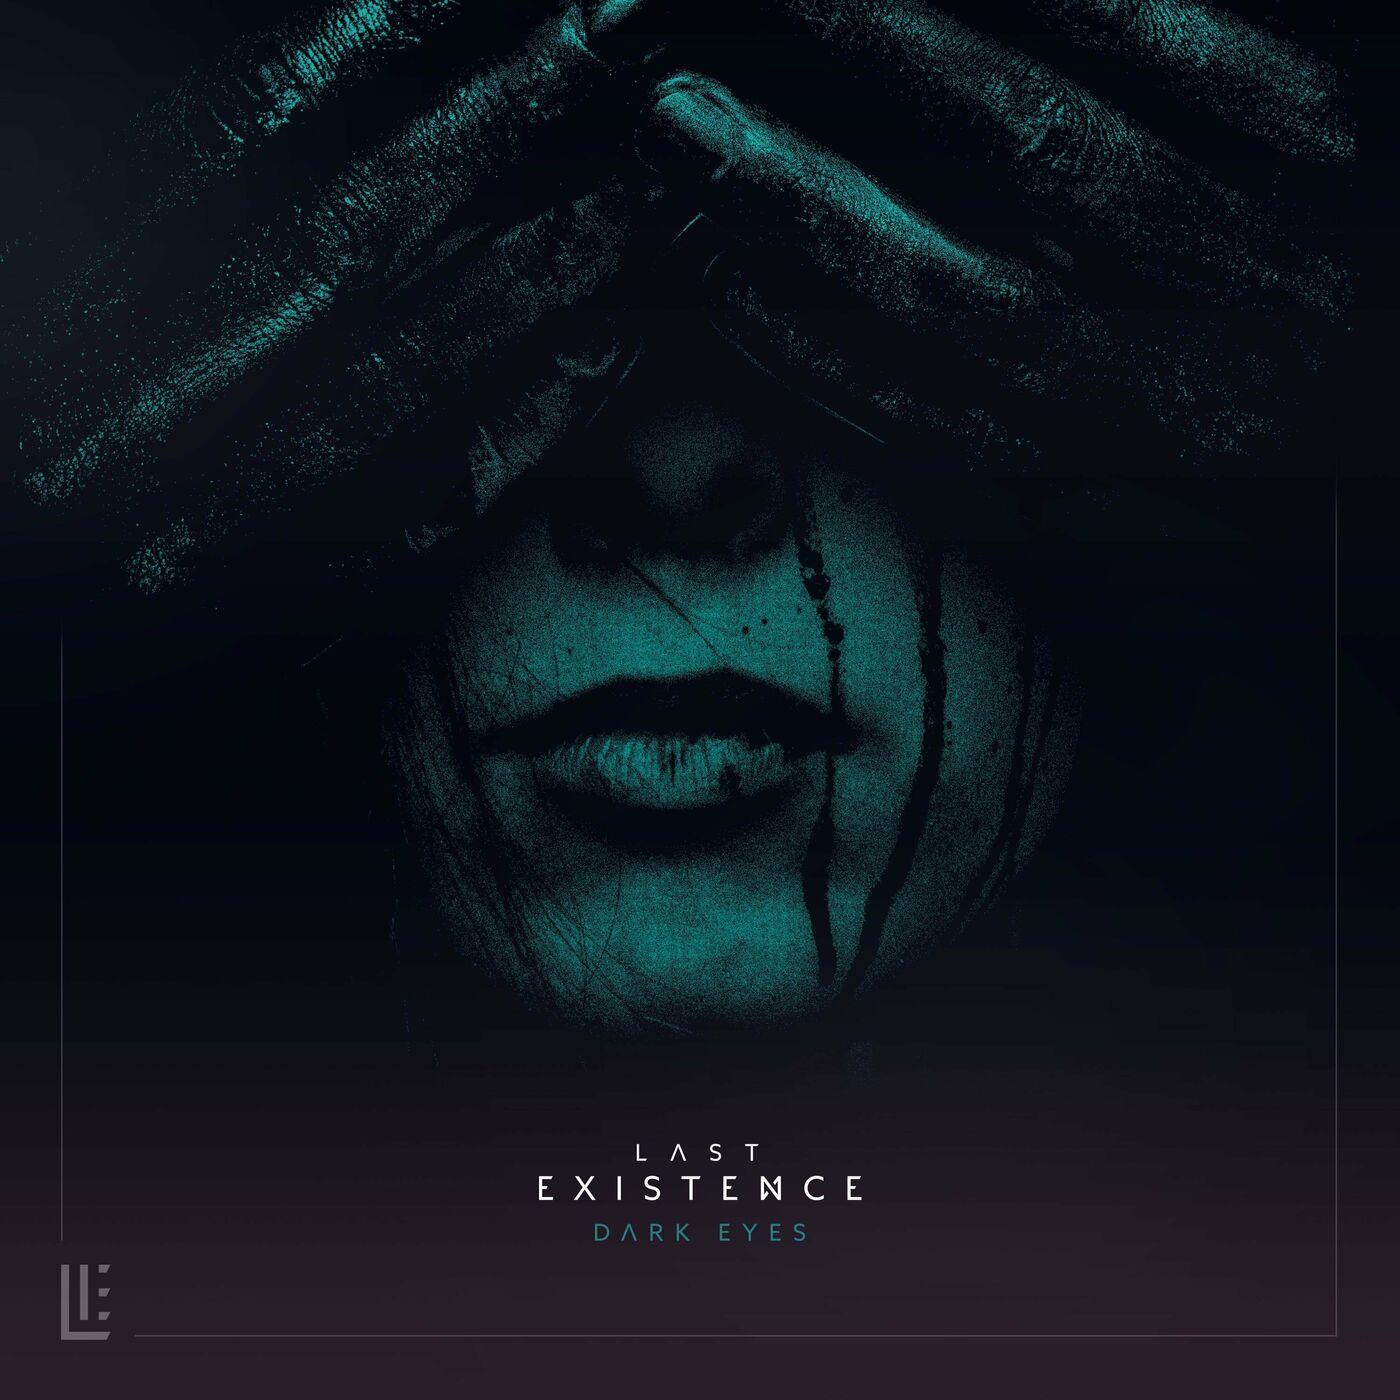 Last Existence - Dark Eyes [single] (2020)